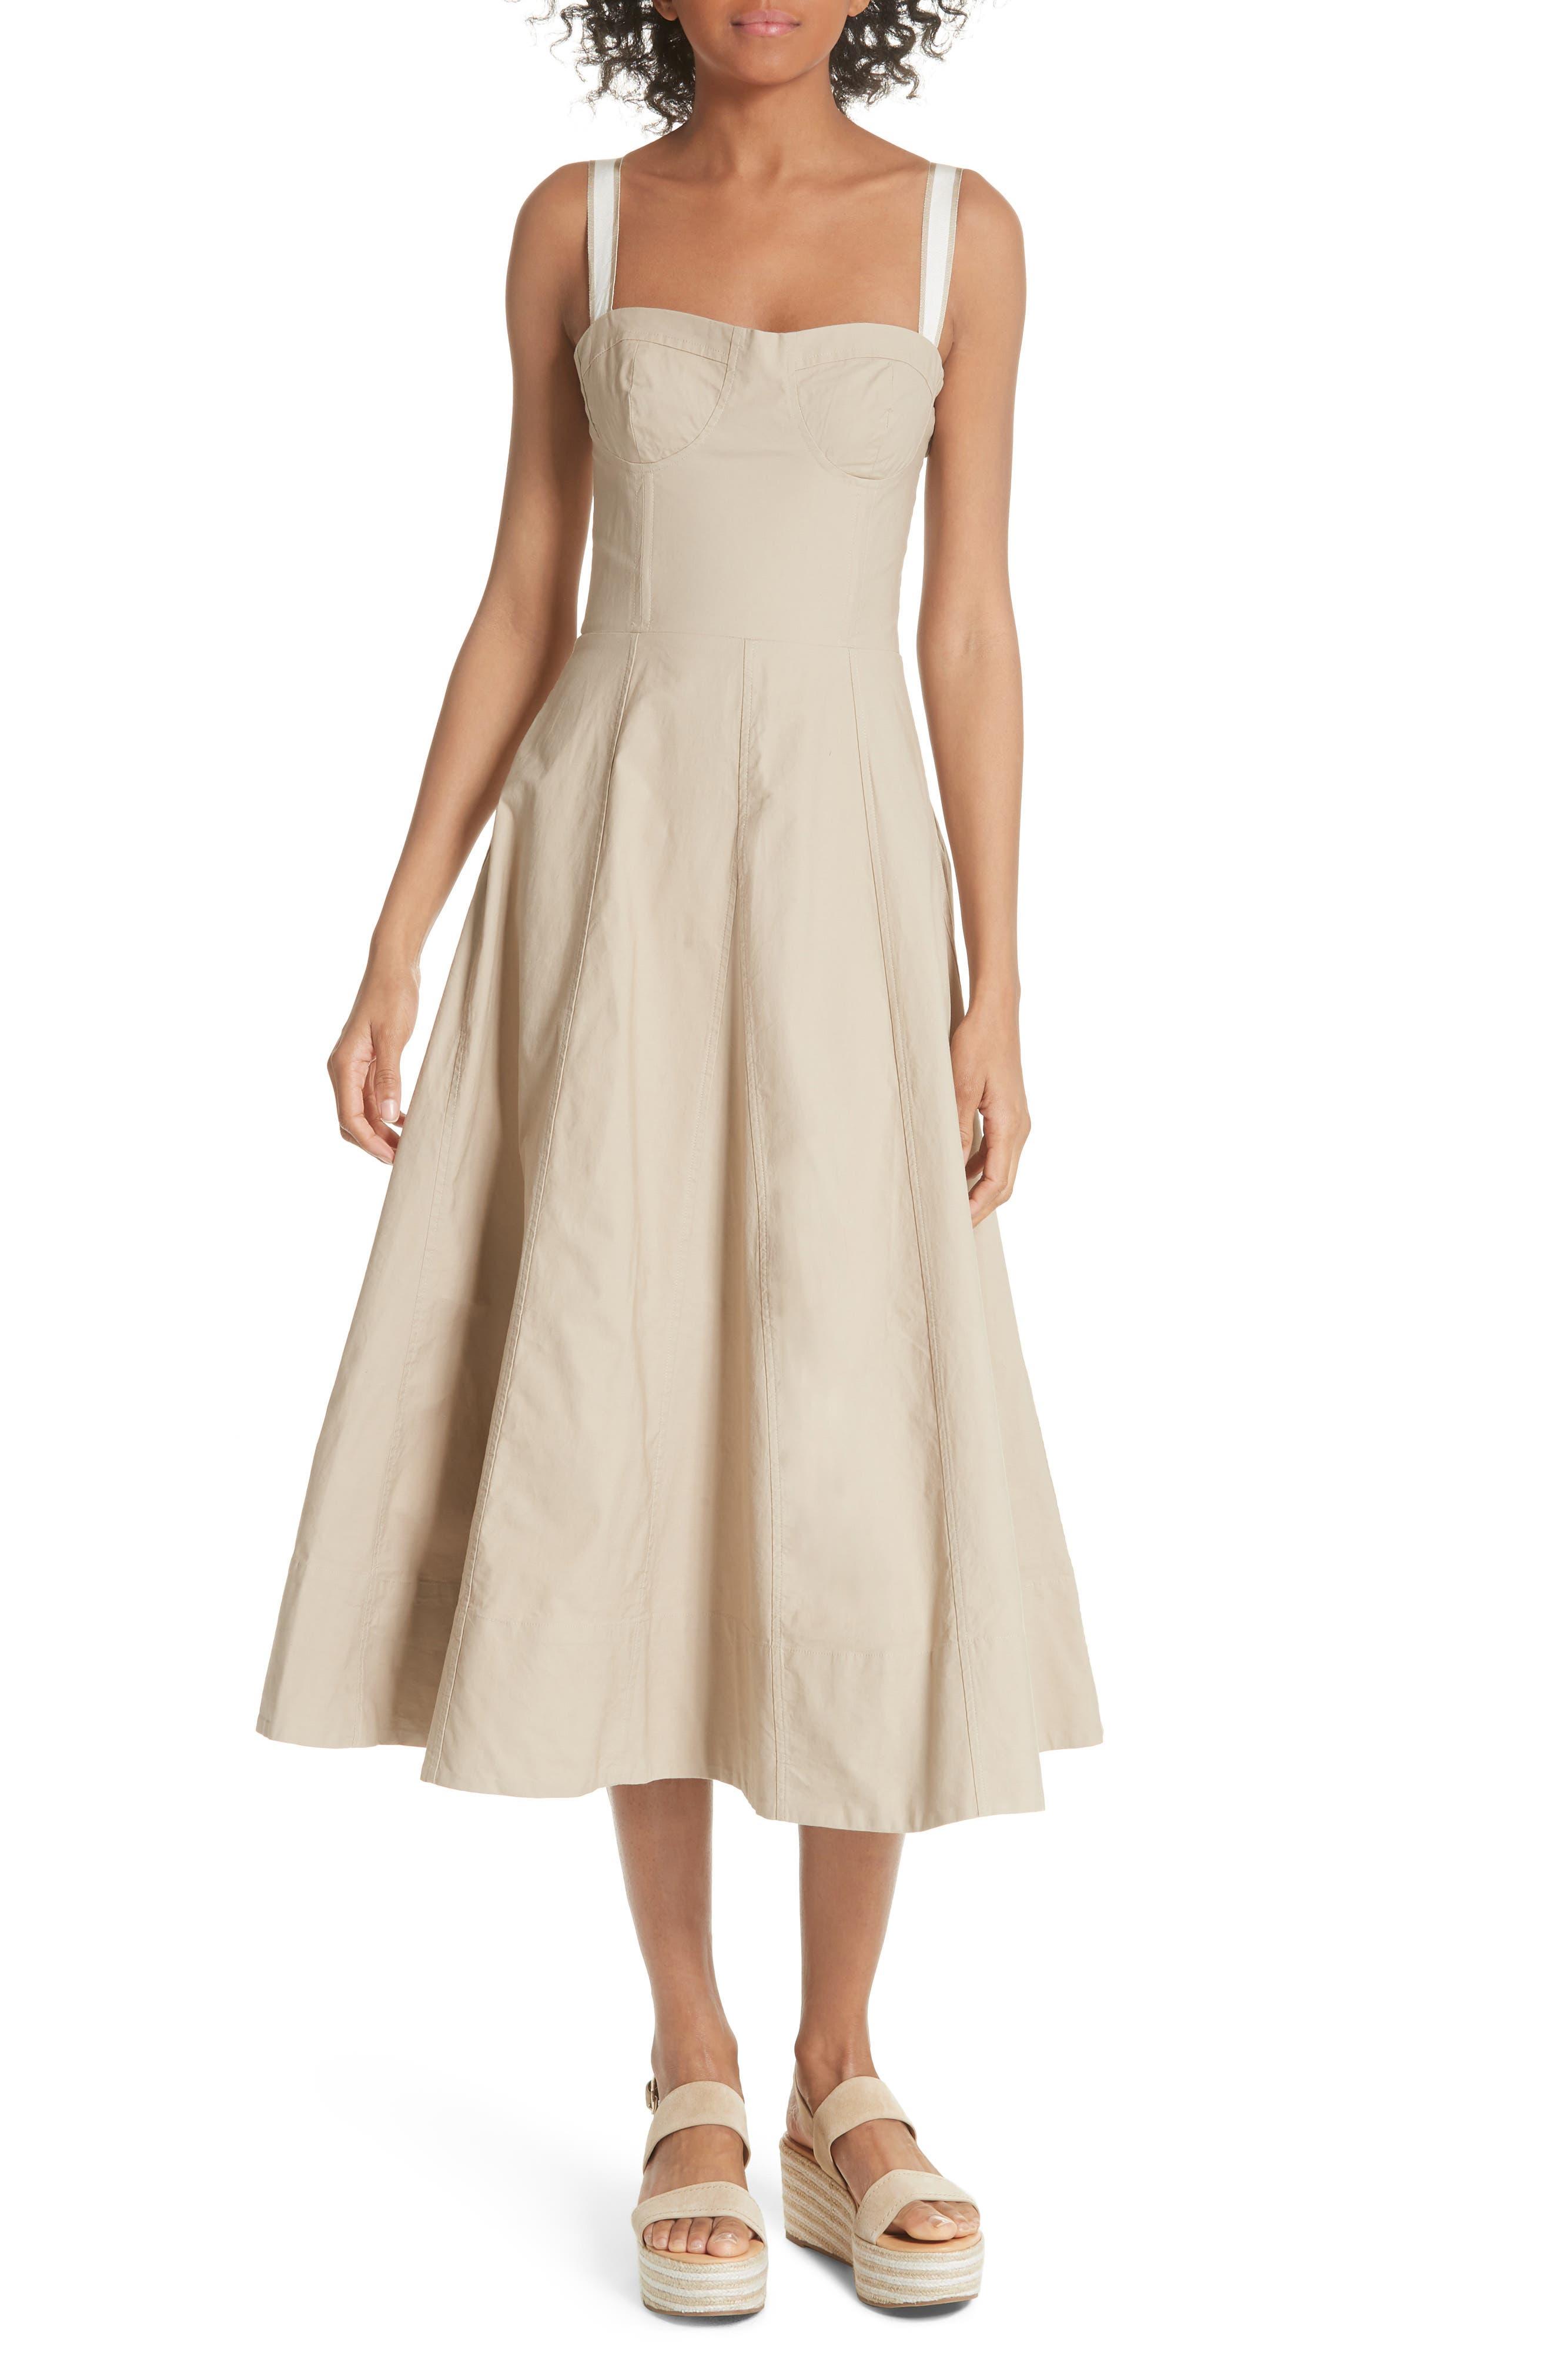 Briel Midi Dress,                             Main thumbnail 1, color,                             Light Sand